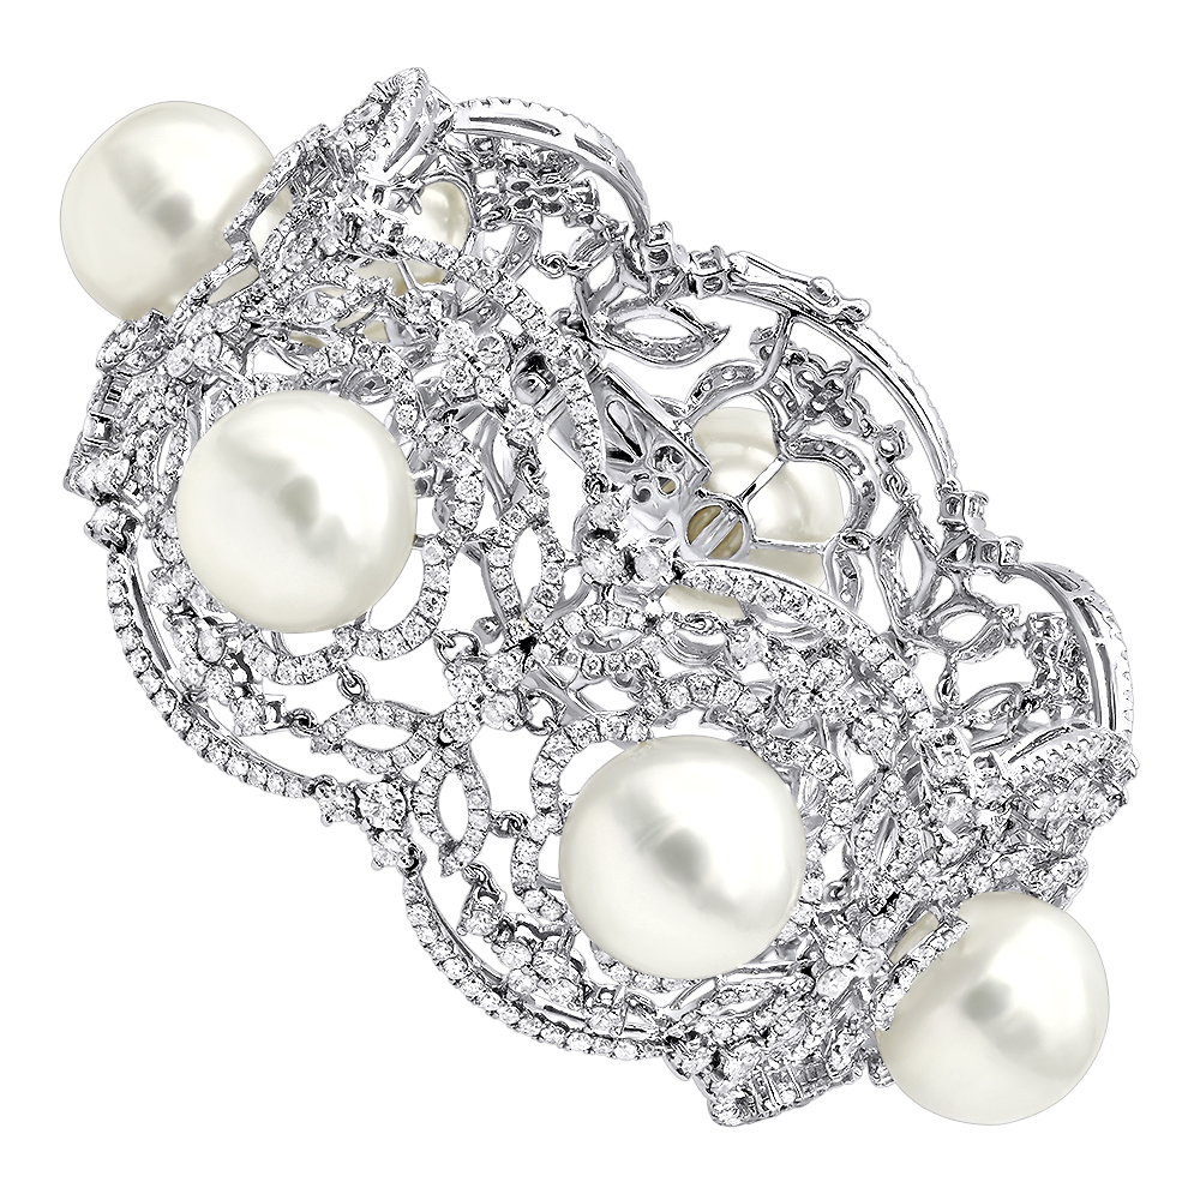 Art Deco White South Sea Pearl and Diamond Bracelet for Women 18k Gold